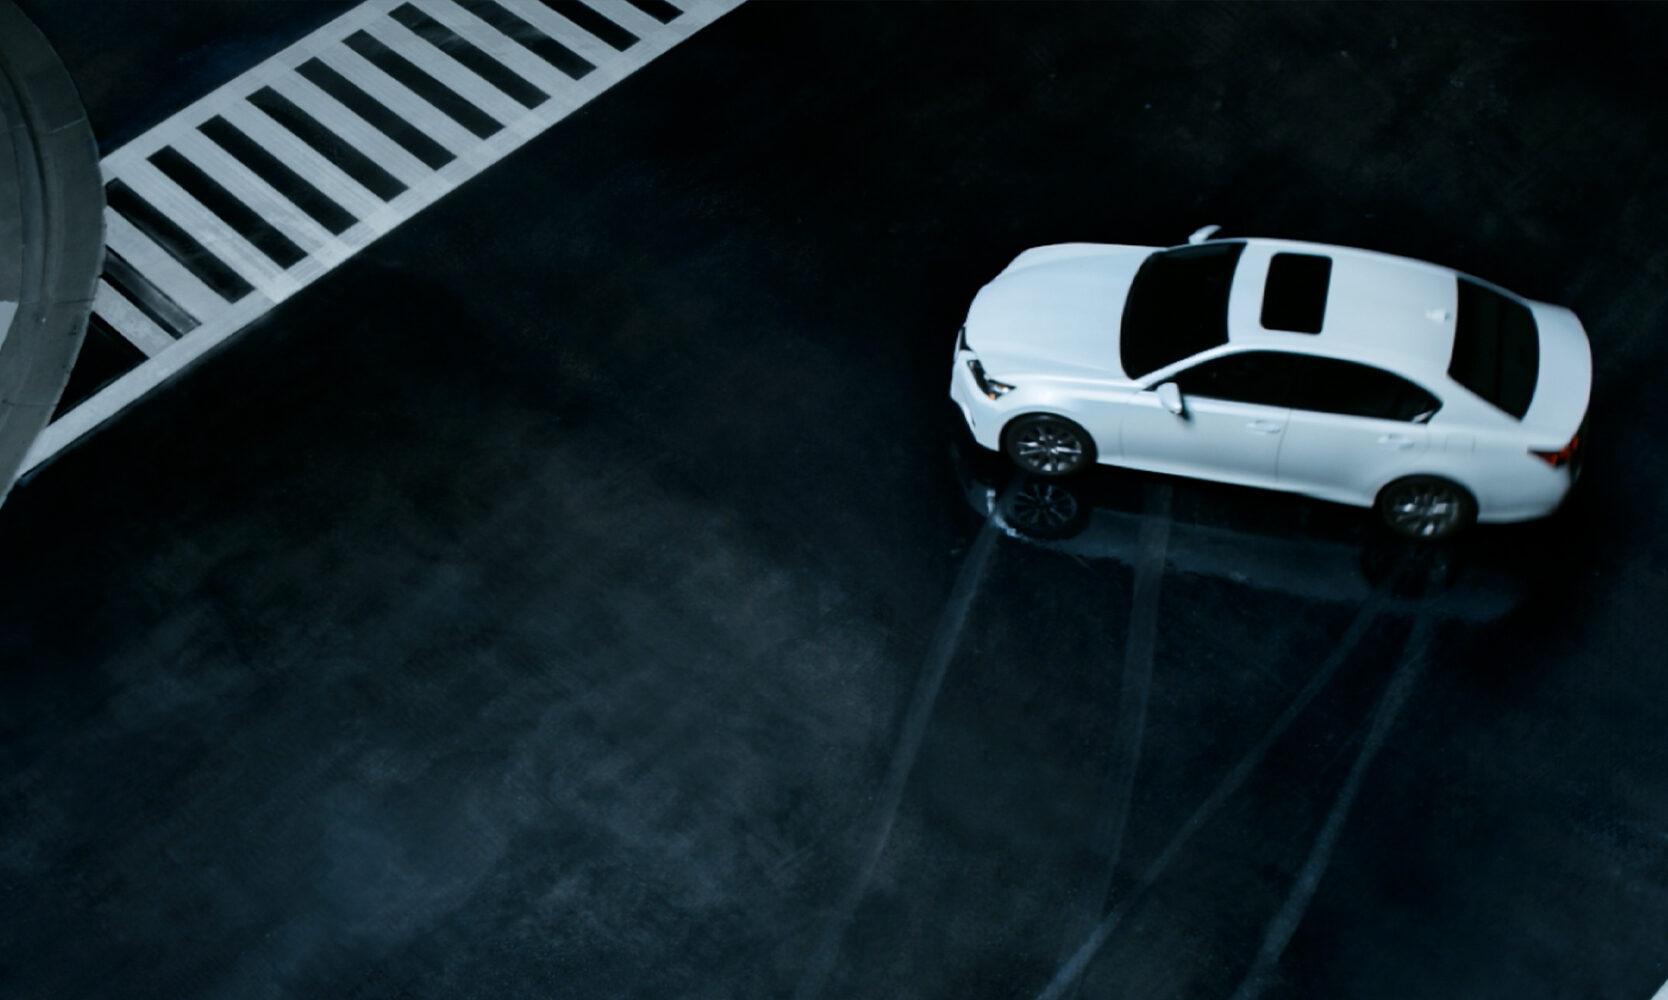 Lexus hypno 1668x1000